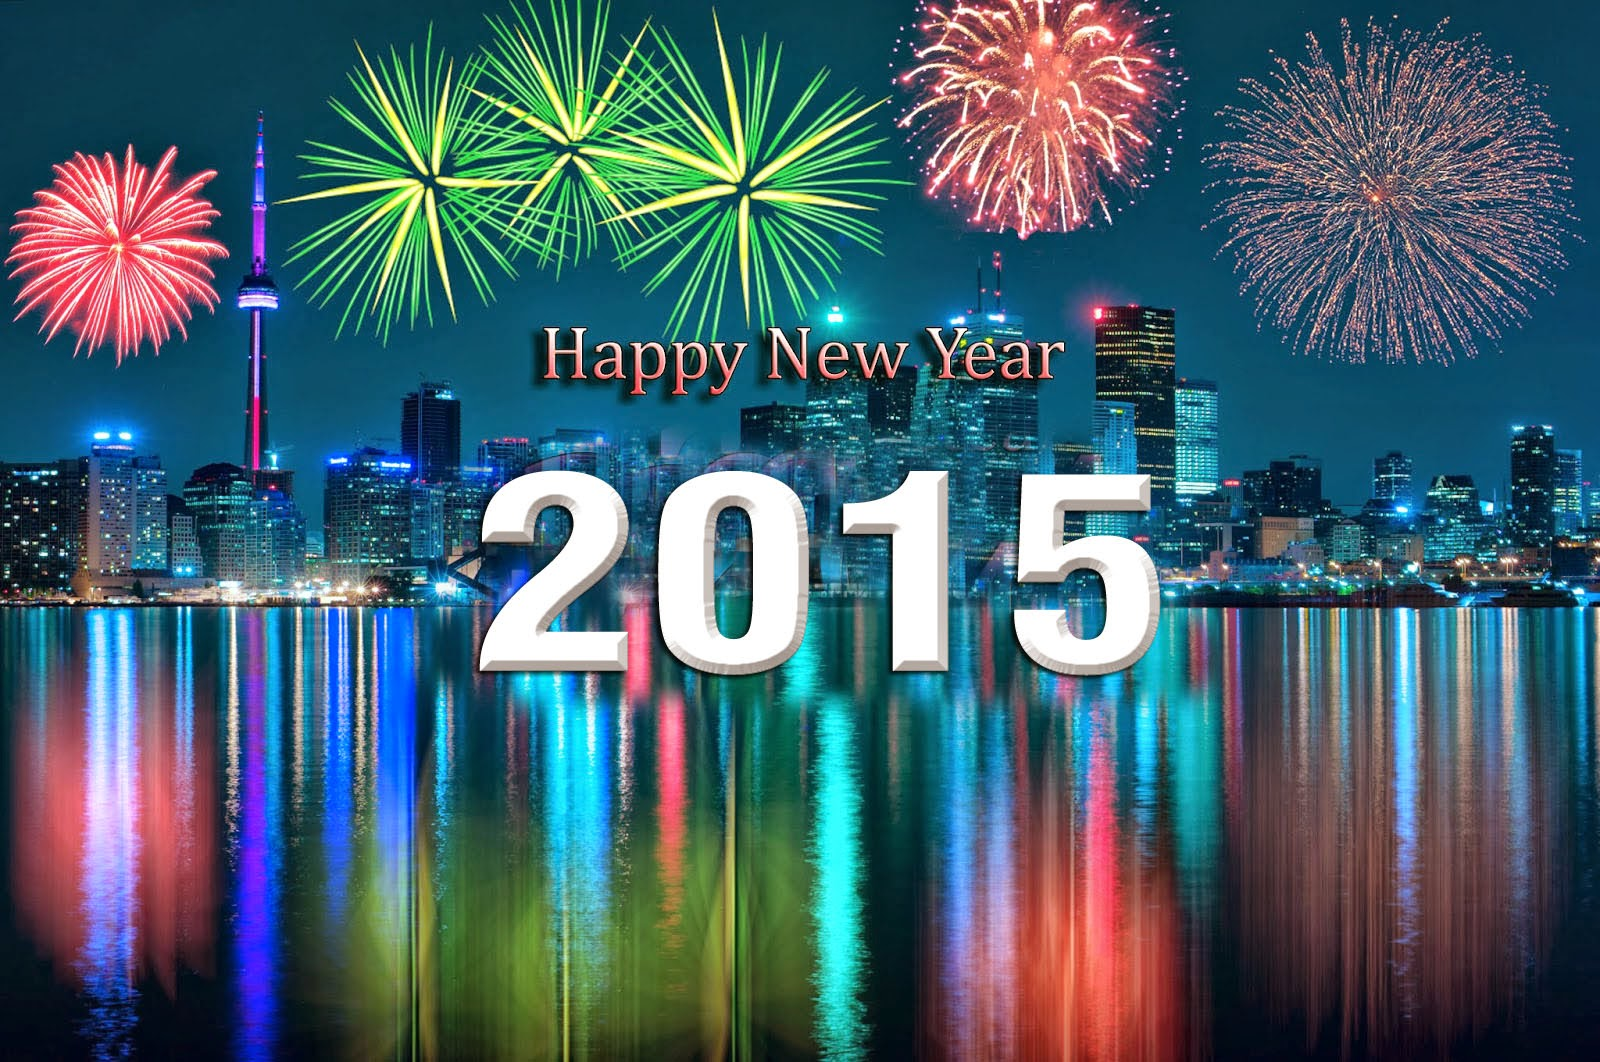 Happy New Year hd wallpaper 2015.